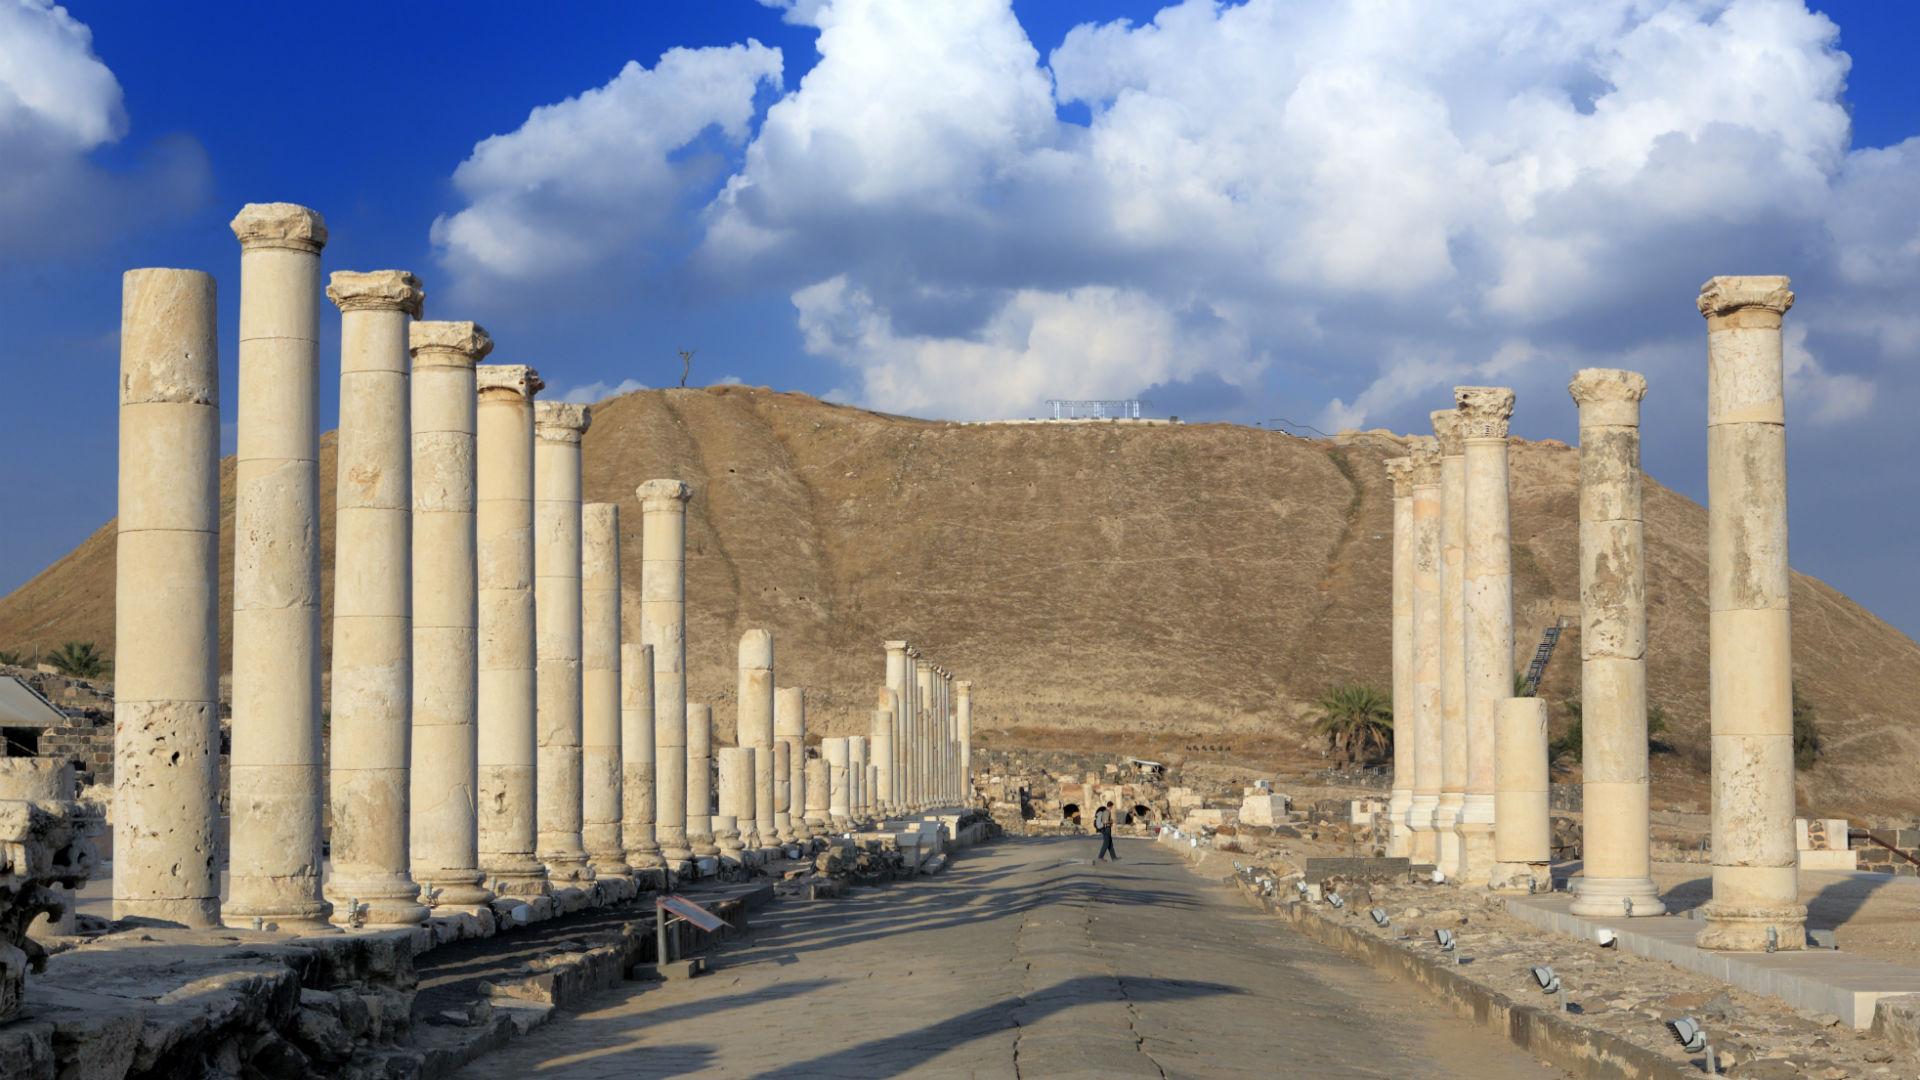 Ruins of ancient city of Scythopolis (2 century AD), Beit She'an, Israel